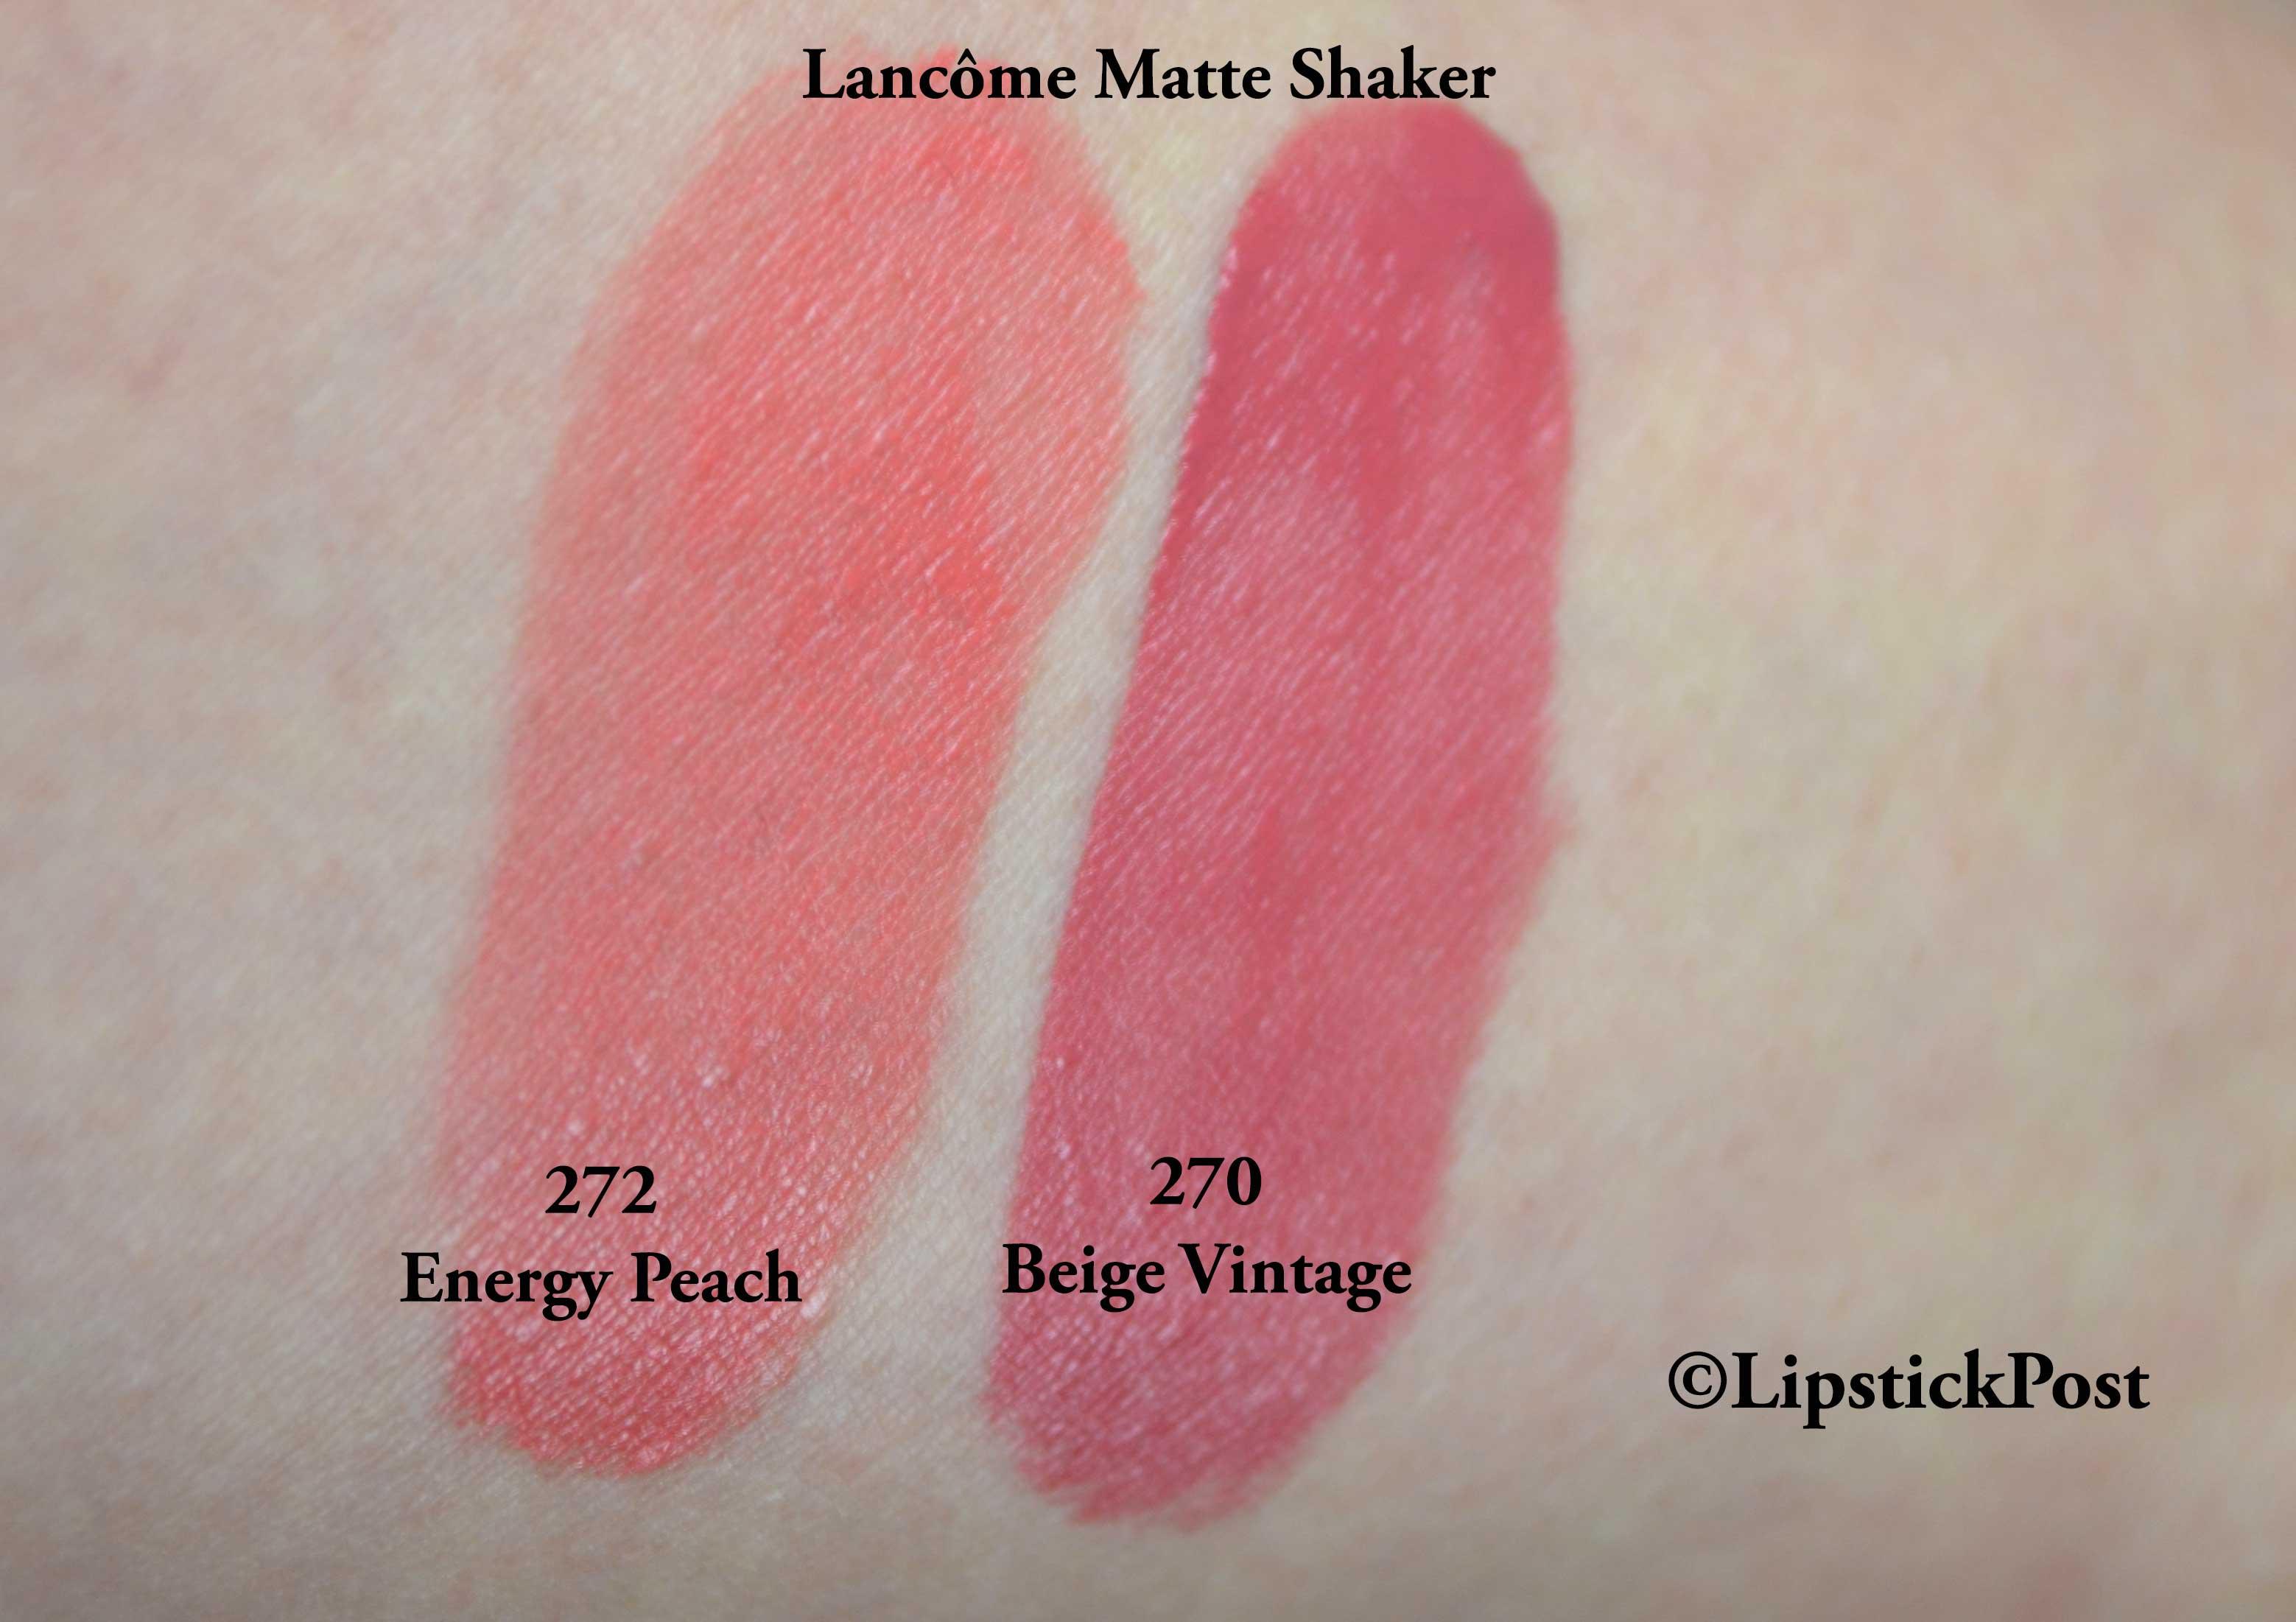 Swatches Lancome Matte Shaker Lipstickpost